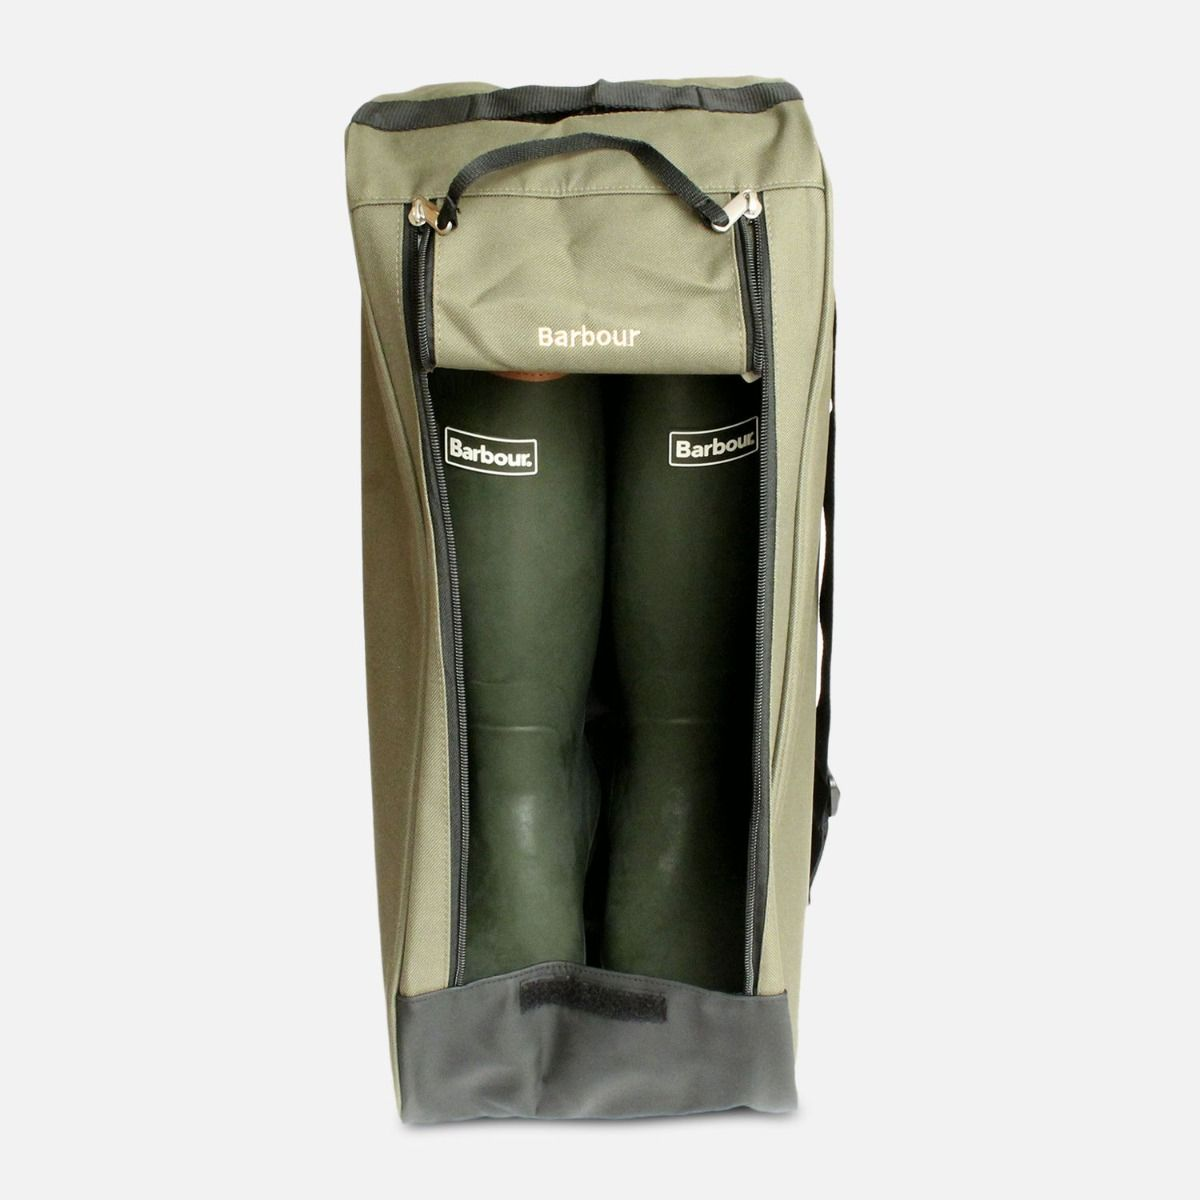 Barbour Tall Waterproof Wellington Boot Bag